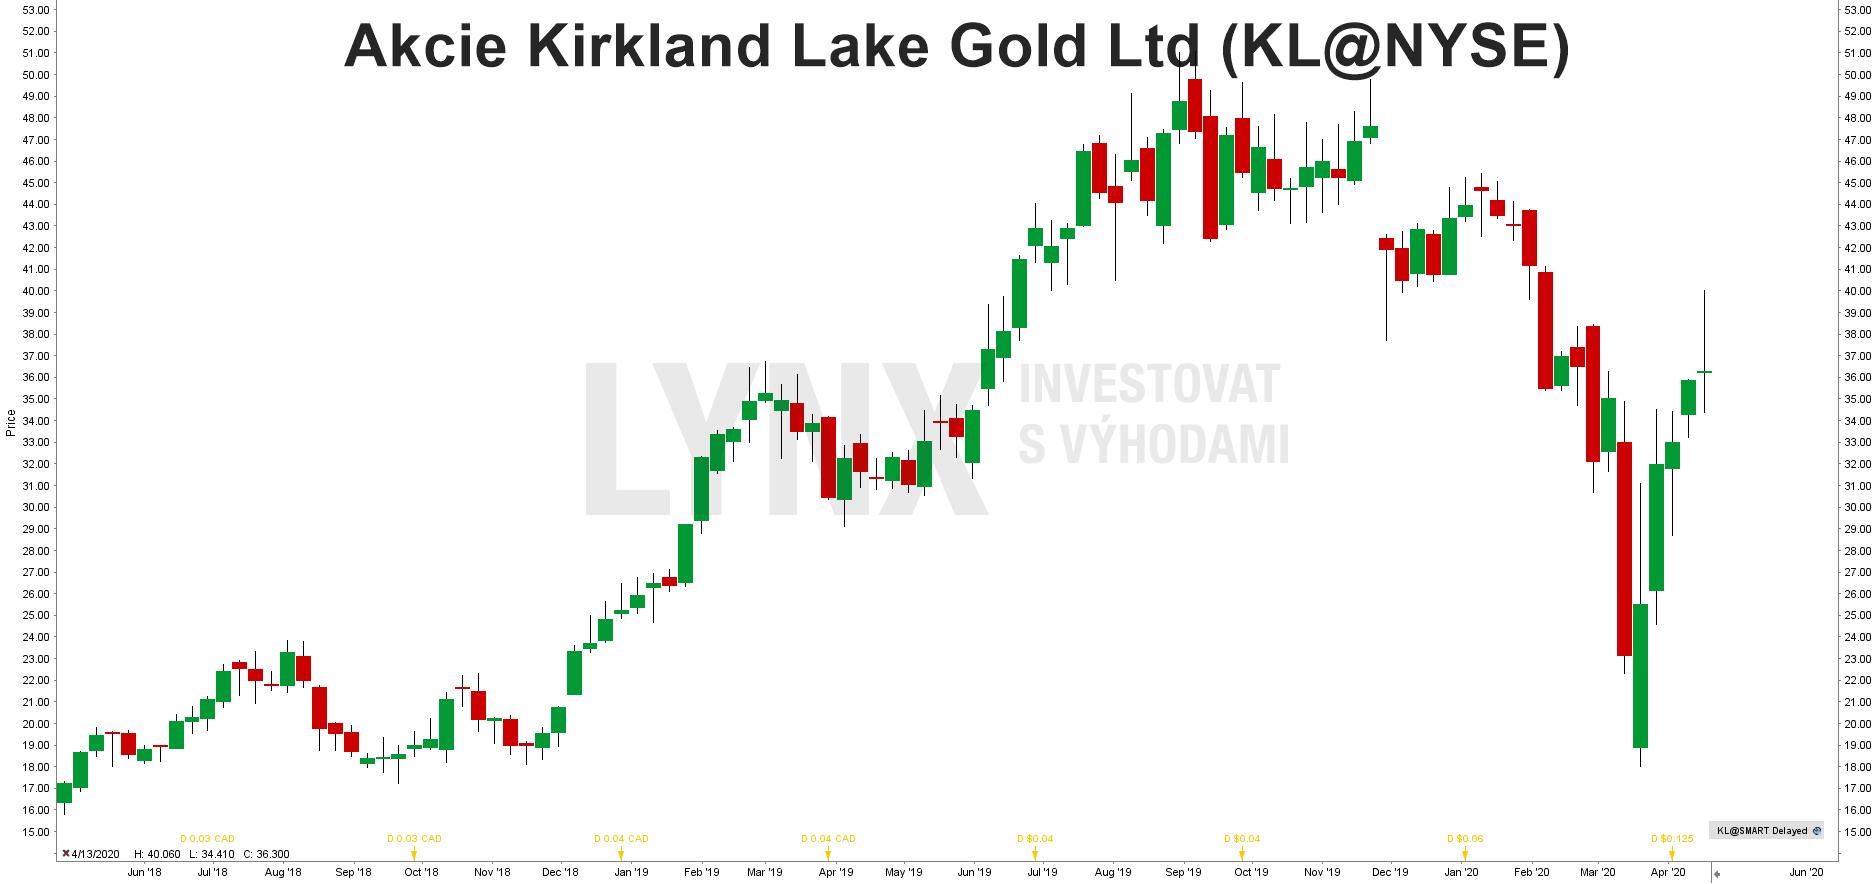 Graf akcie Kirkland Lake Gold (KL)